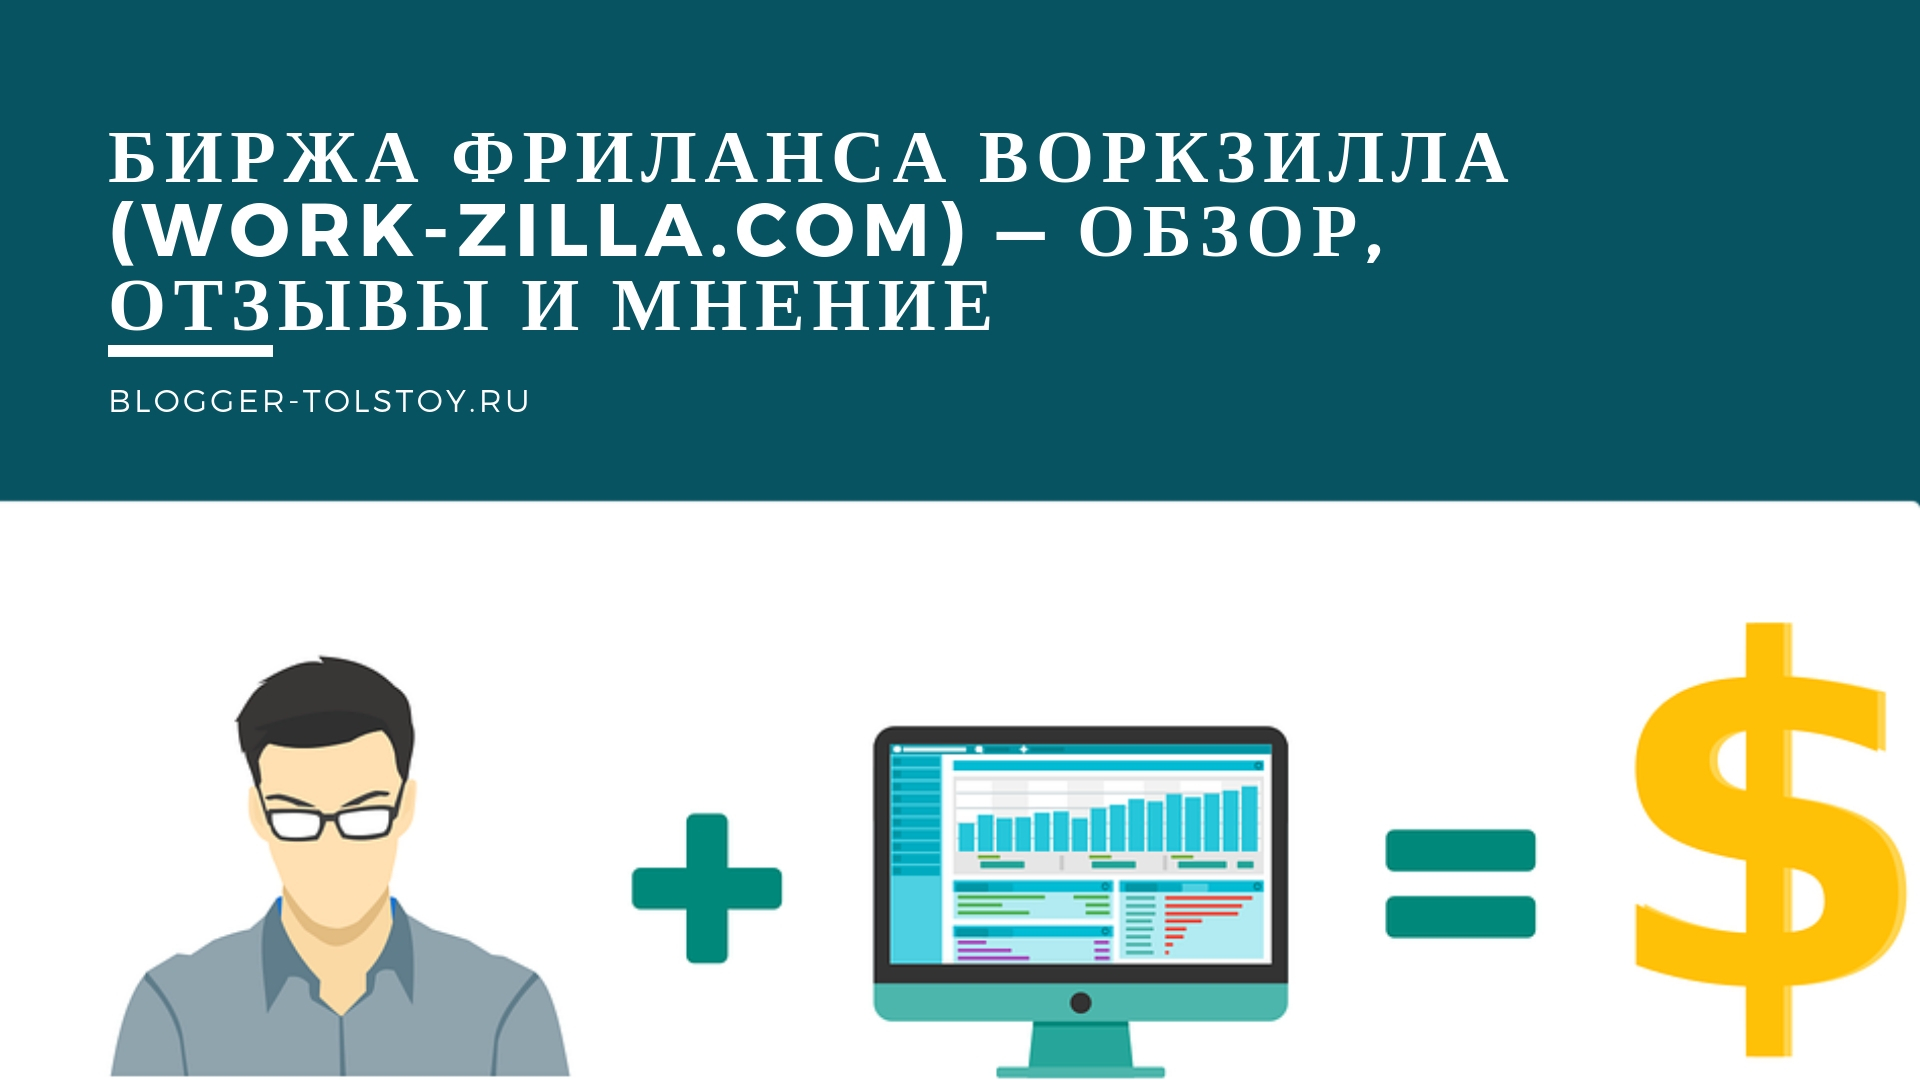 Воркзилла (work-zilla.com)